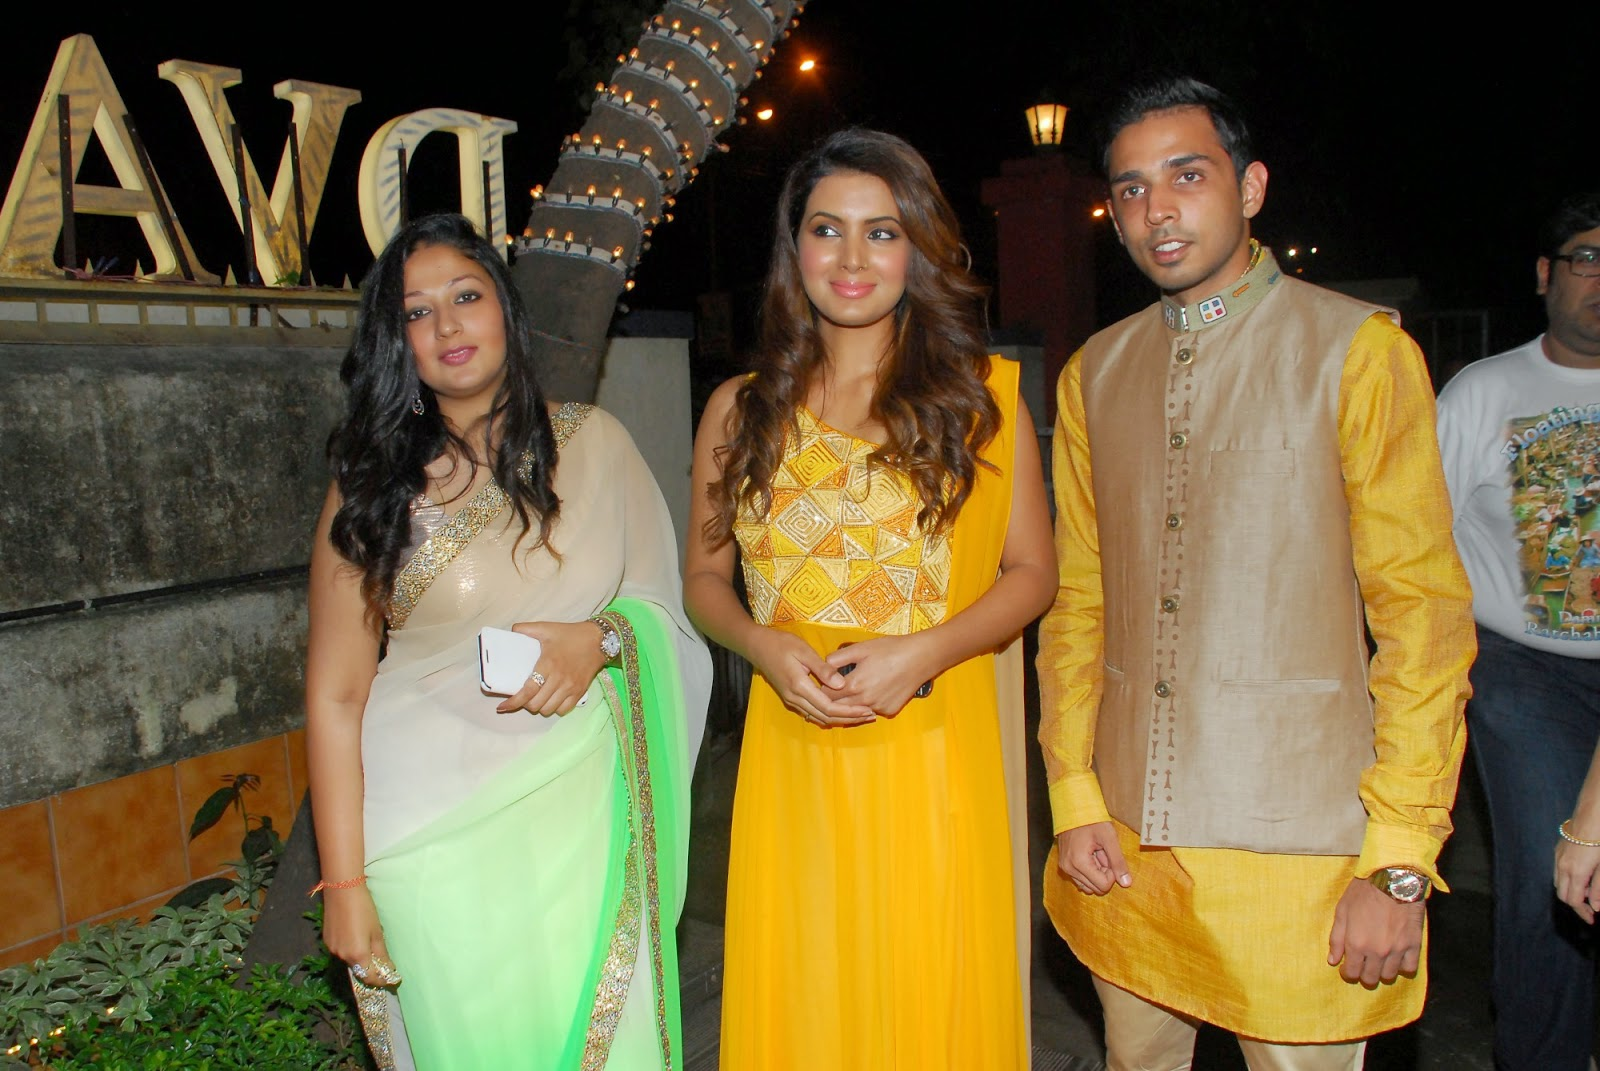 Geeta Basra at DVAR Photography and Fashion Exhibit Event